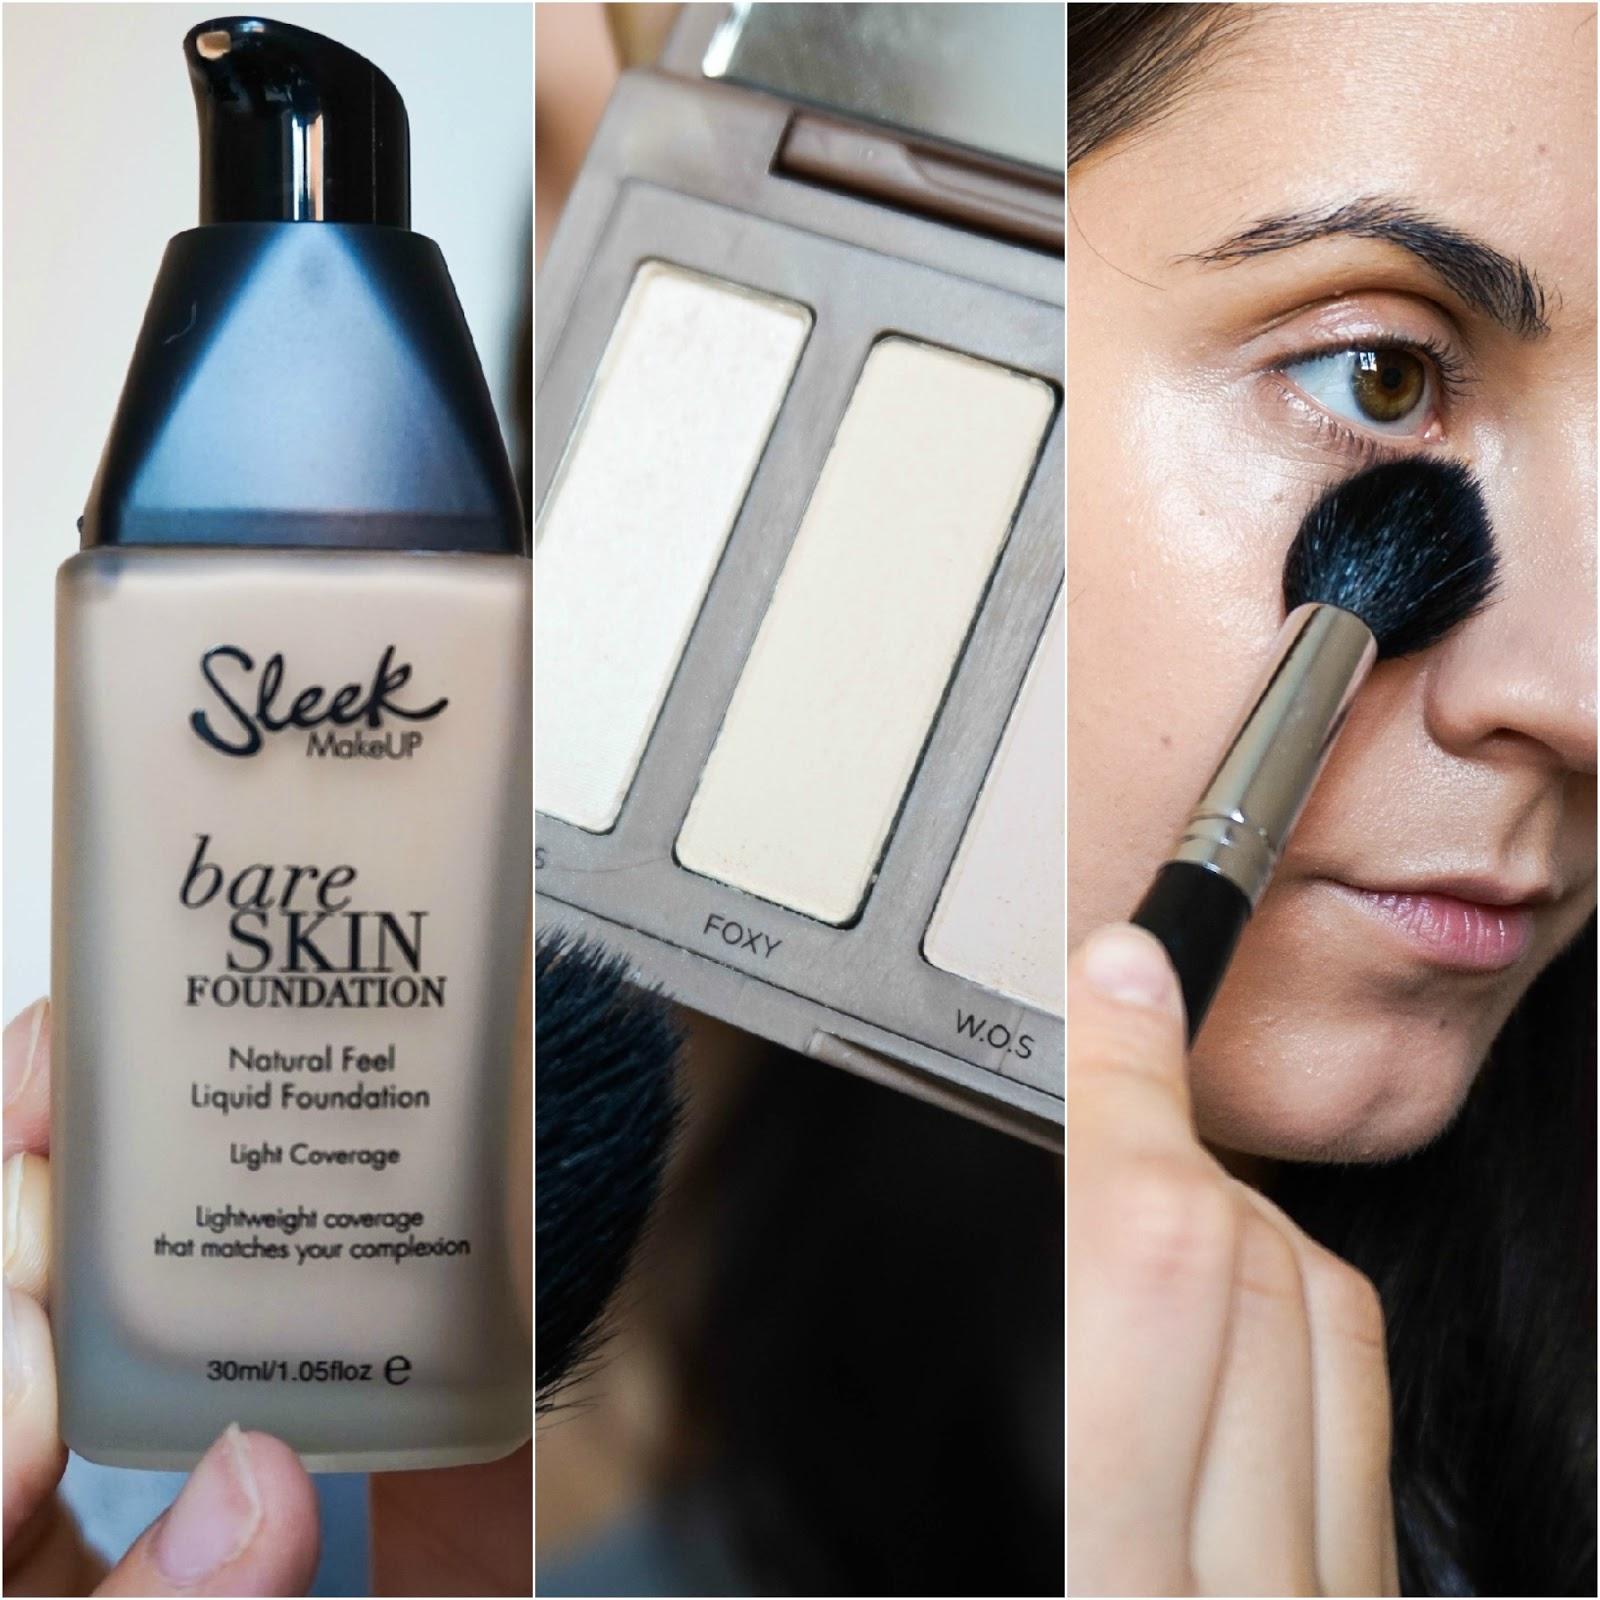 Sleek Bare Skin Foundation, Urban Decay Naked Basics Palette